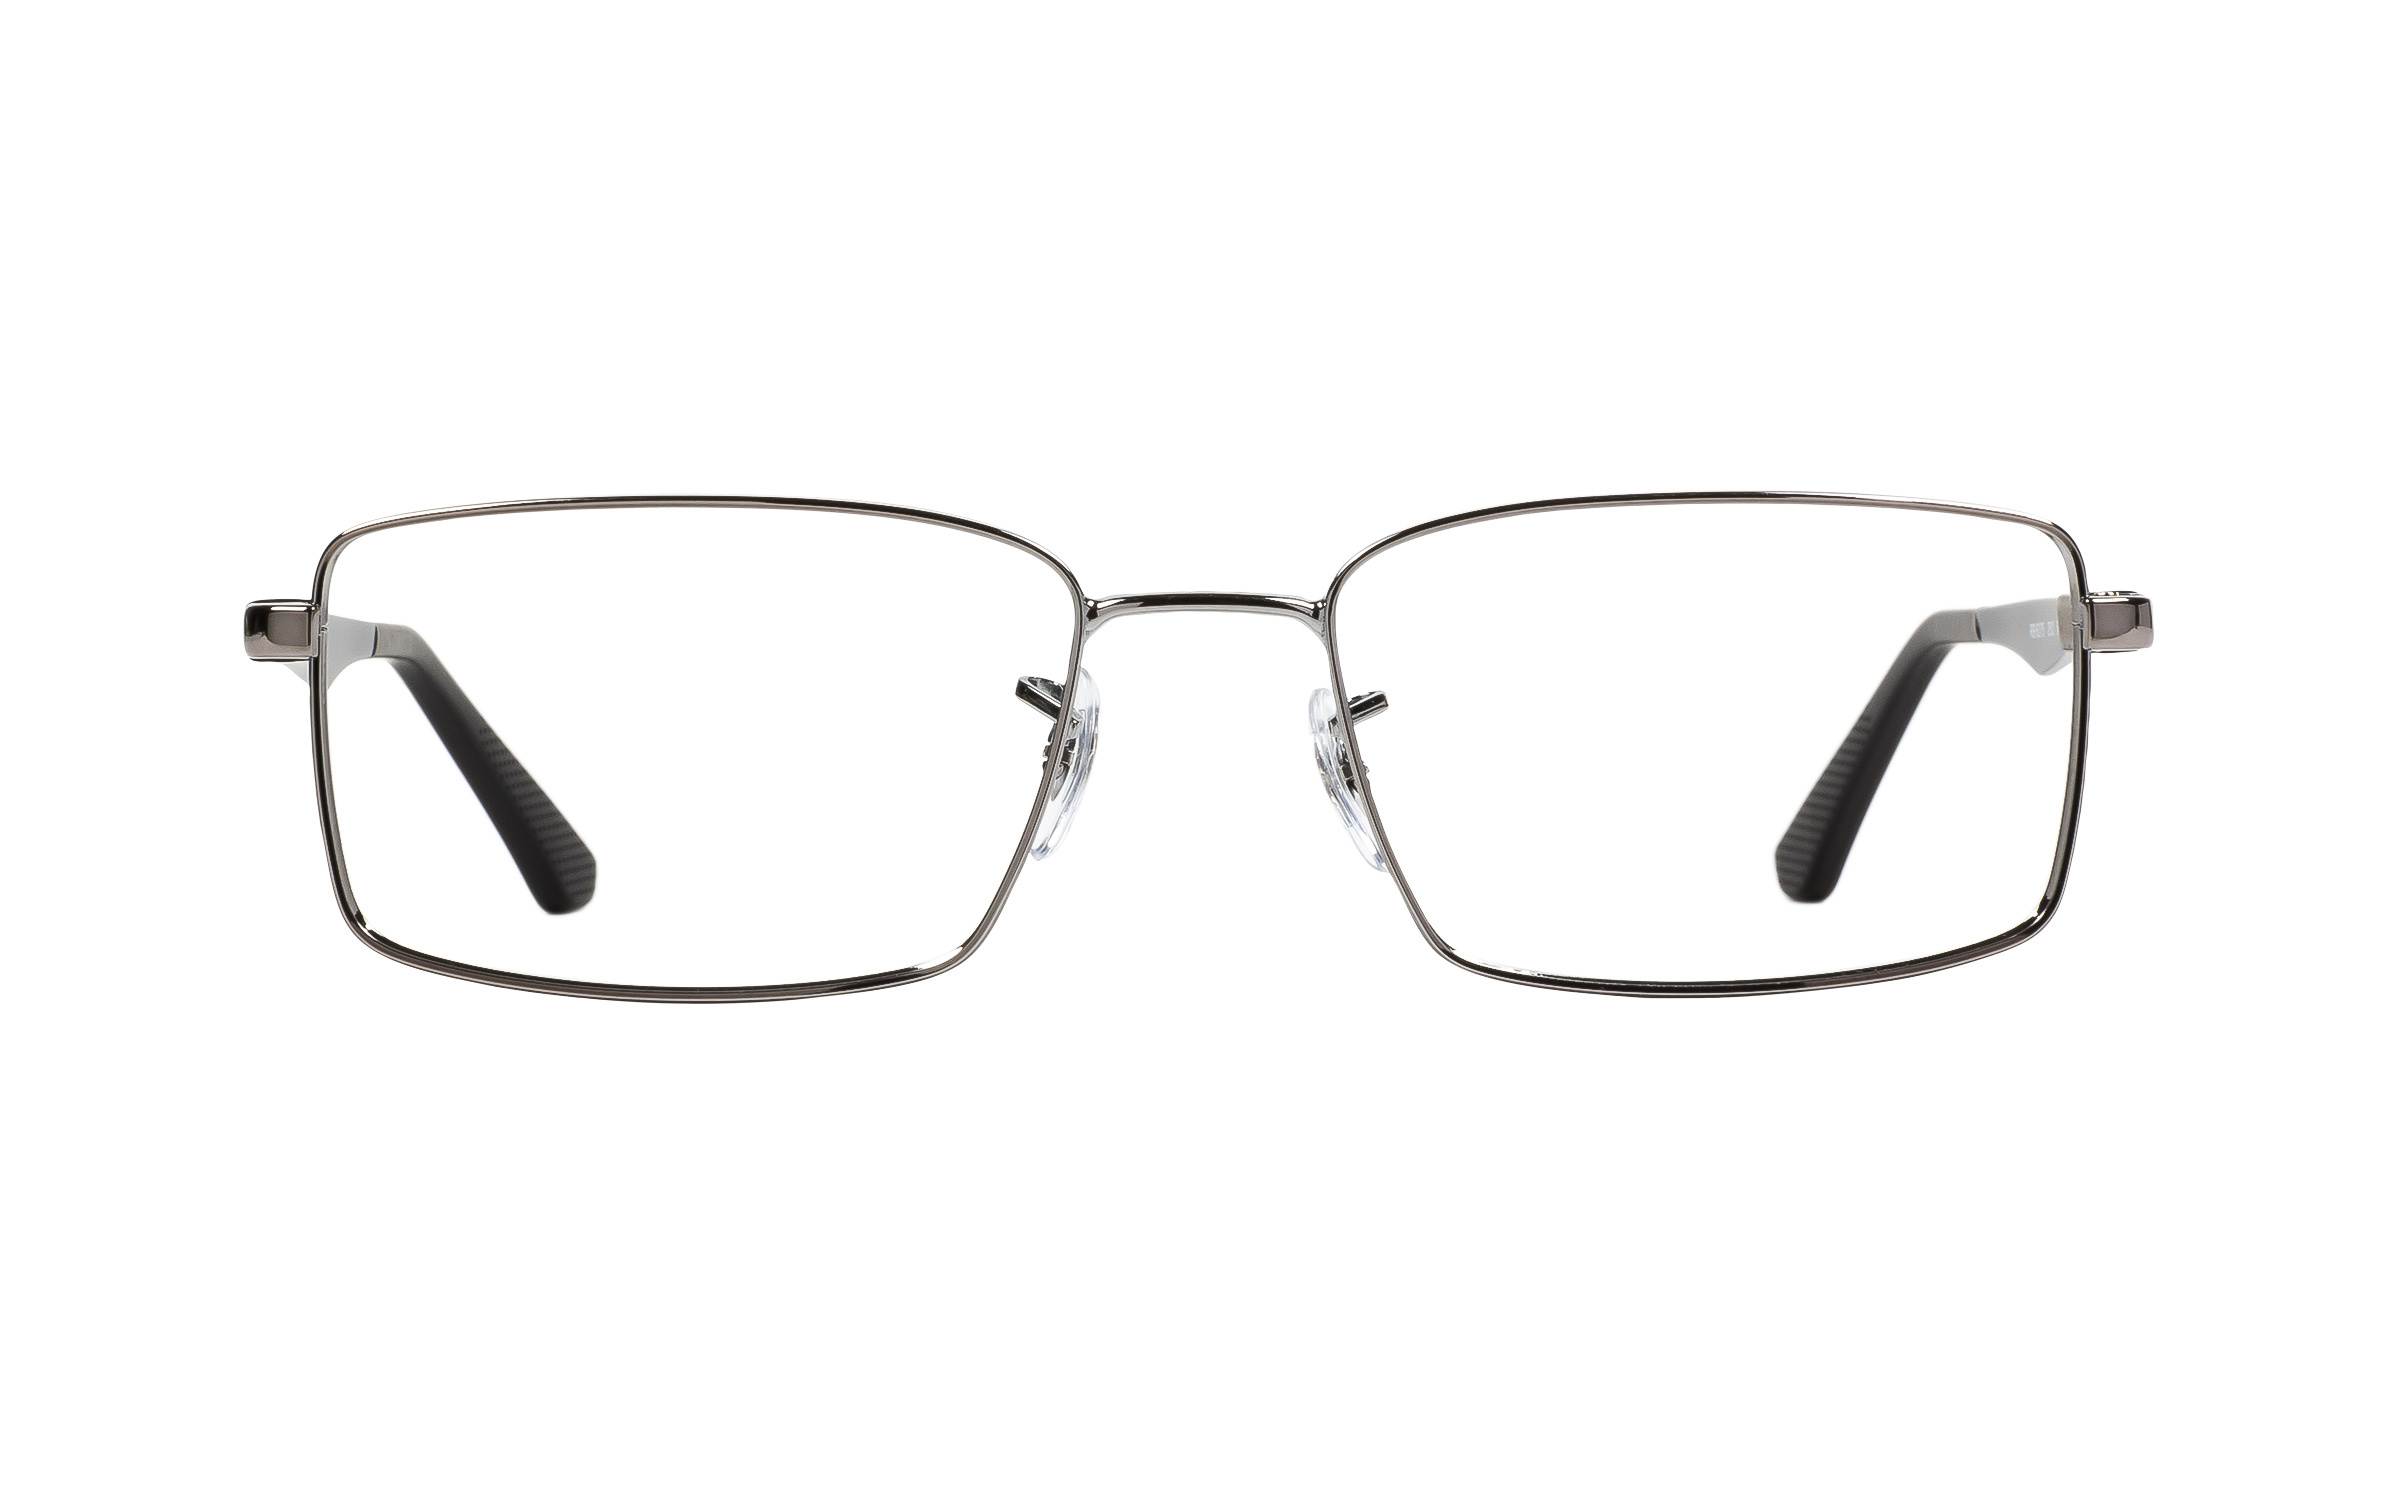 http://www.coastal.com/ - Ray-Ban Glasses Round Grey Metal Online Coastal